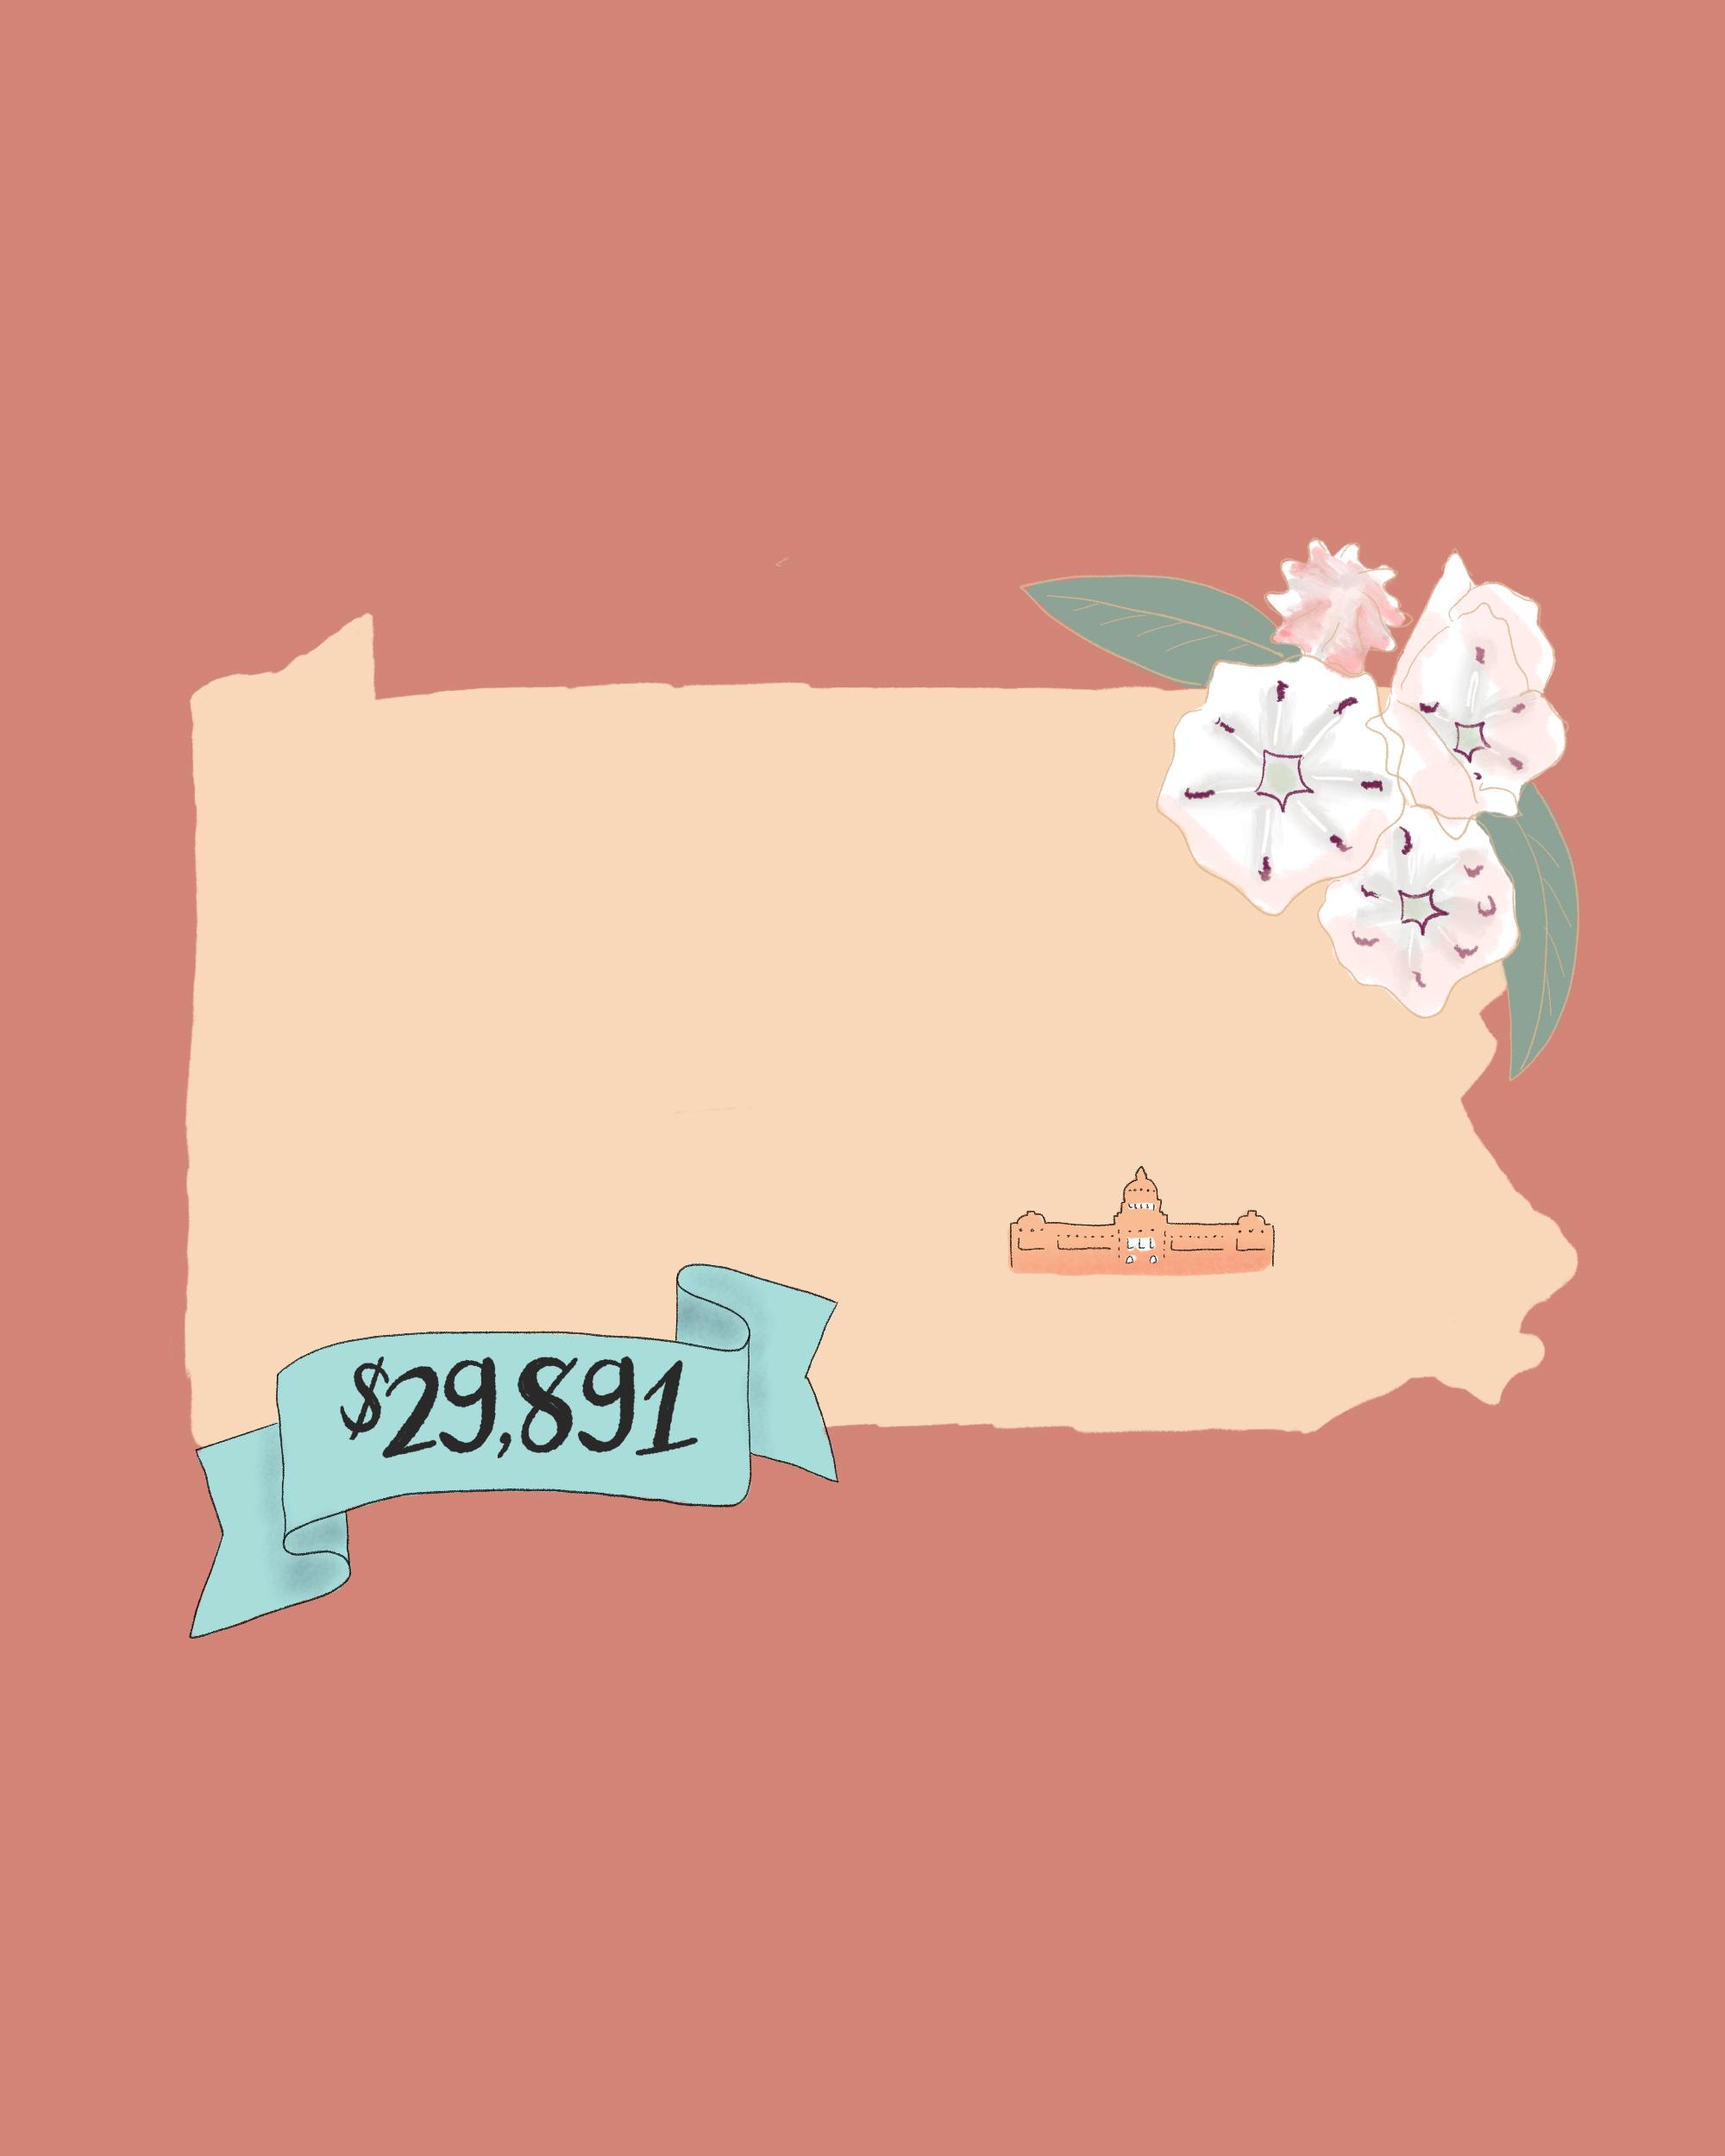 state wedding costs illustration pennsylvania